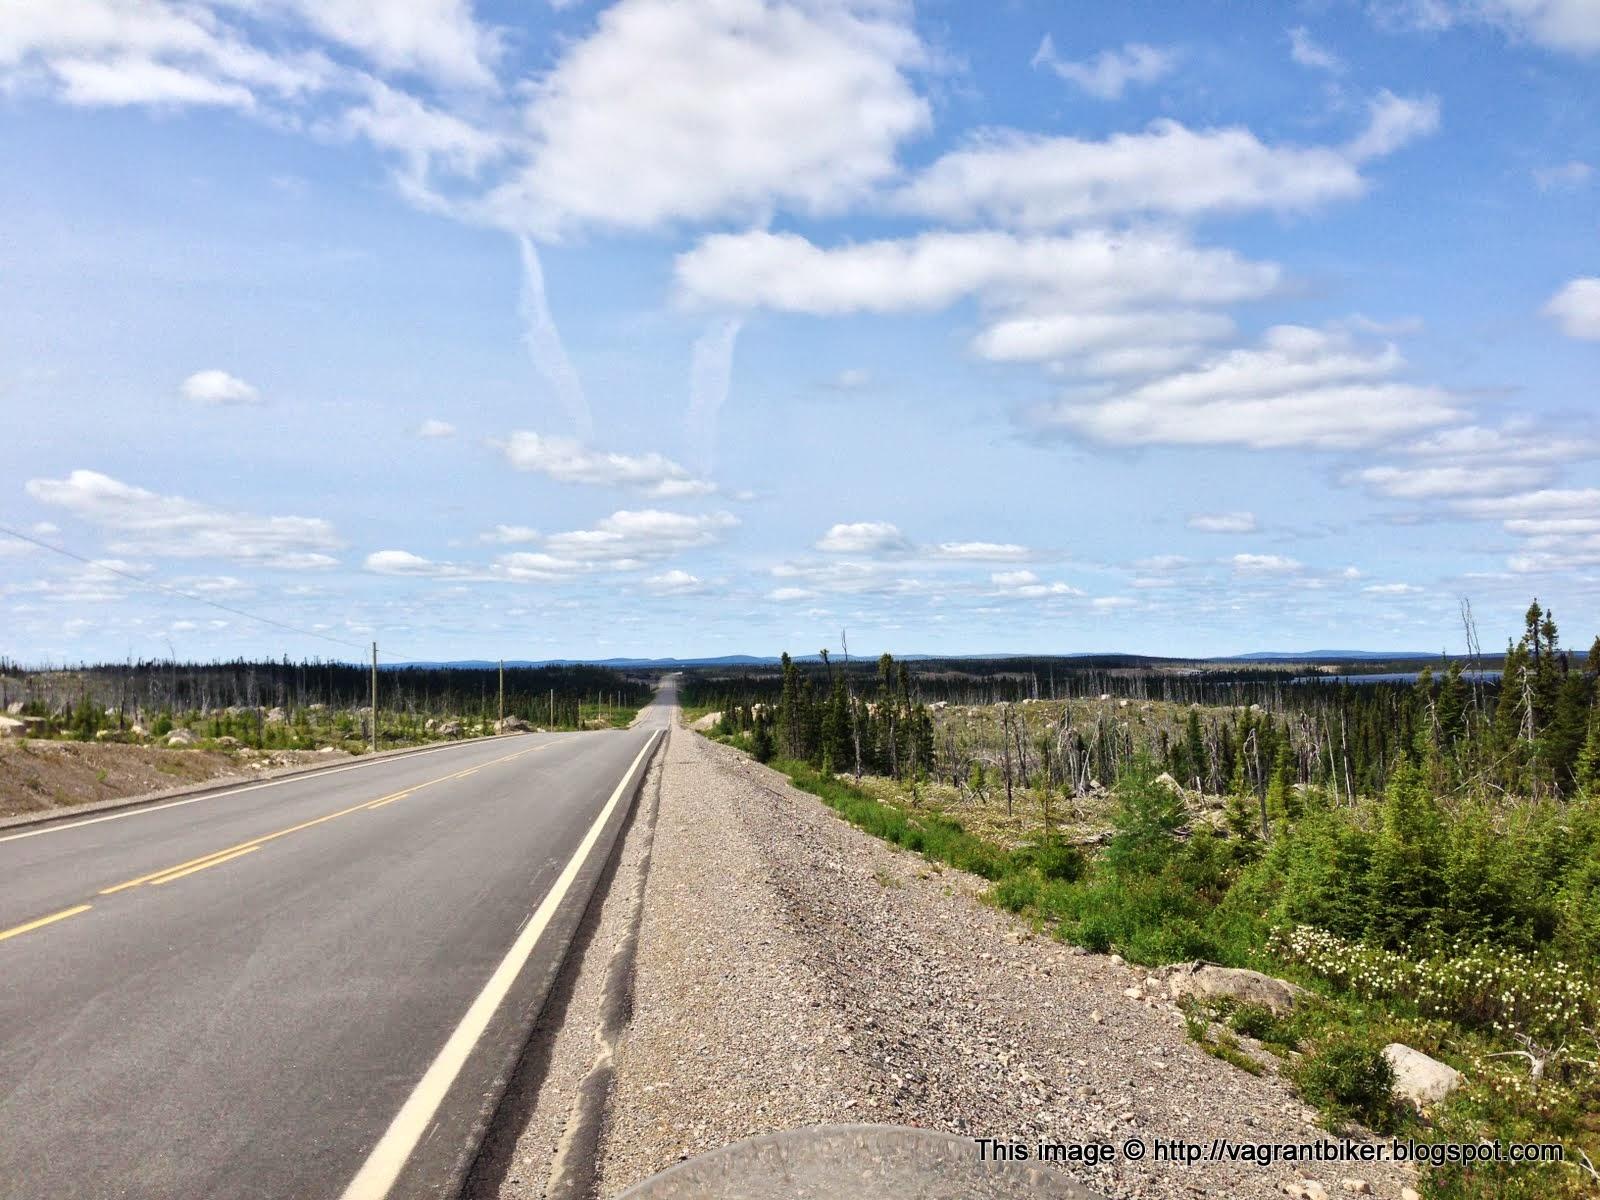 Labrador city escorts Shemale Maritimes - Shemale Maritimes Escorts Page 1